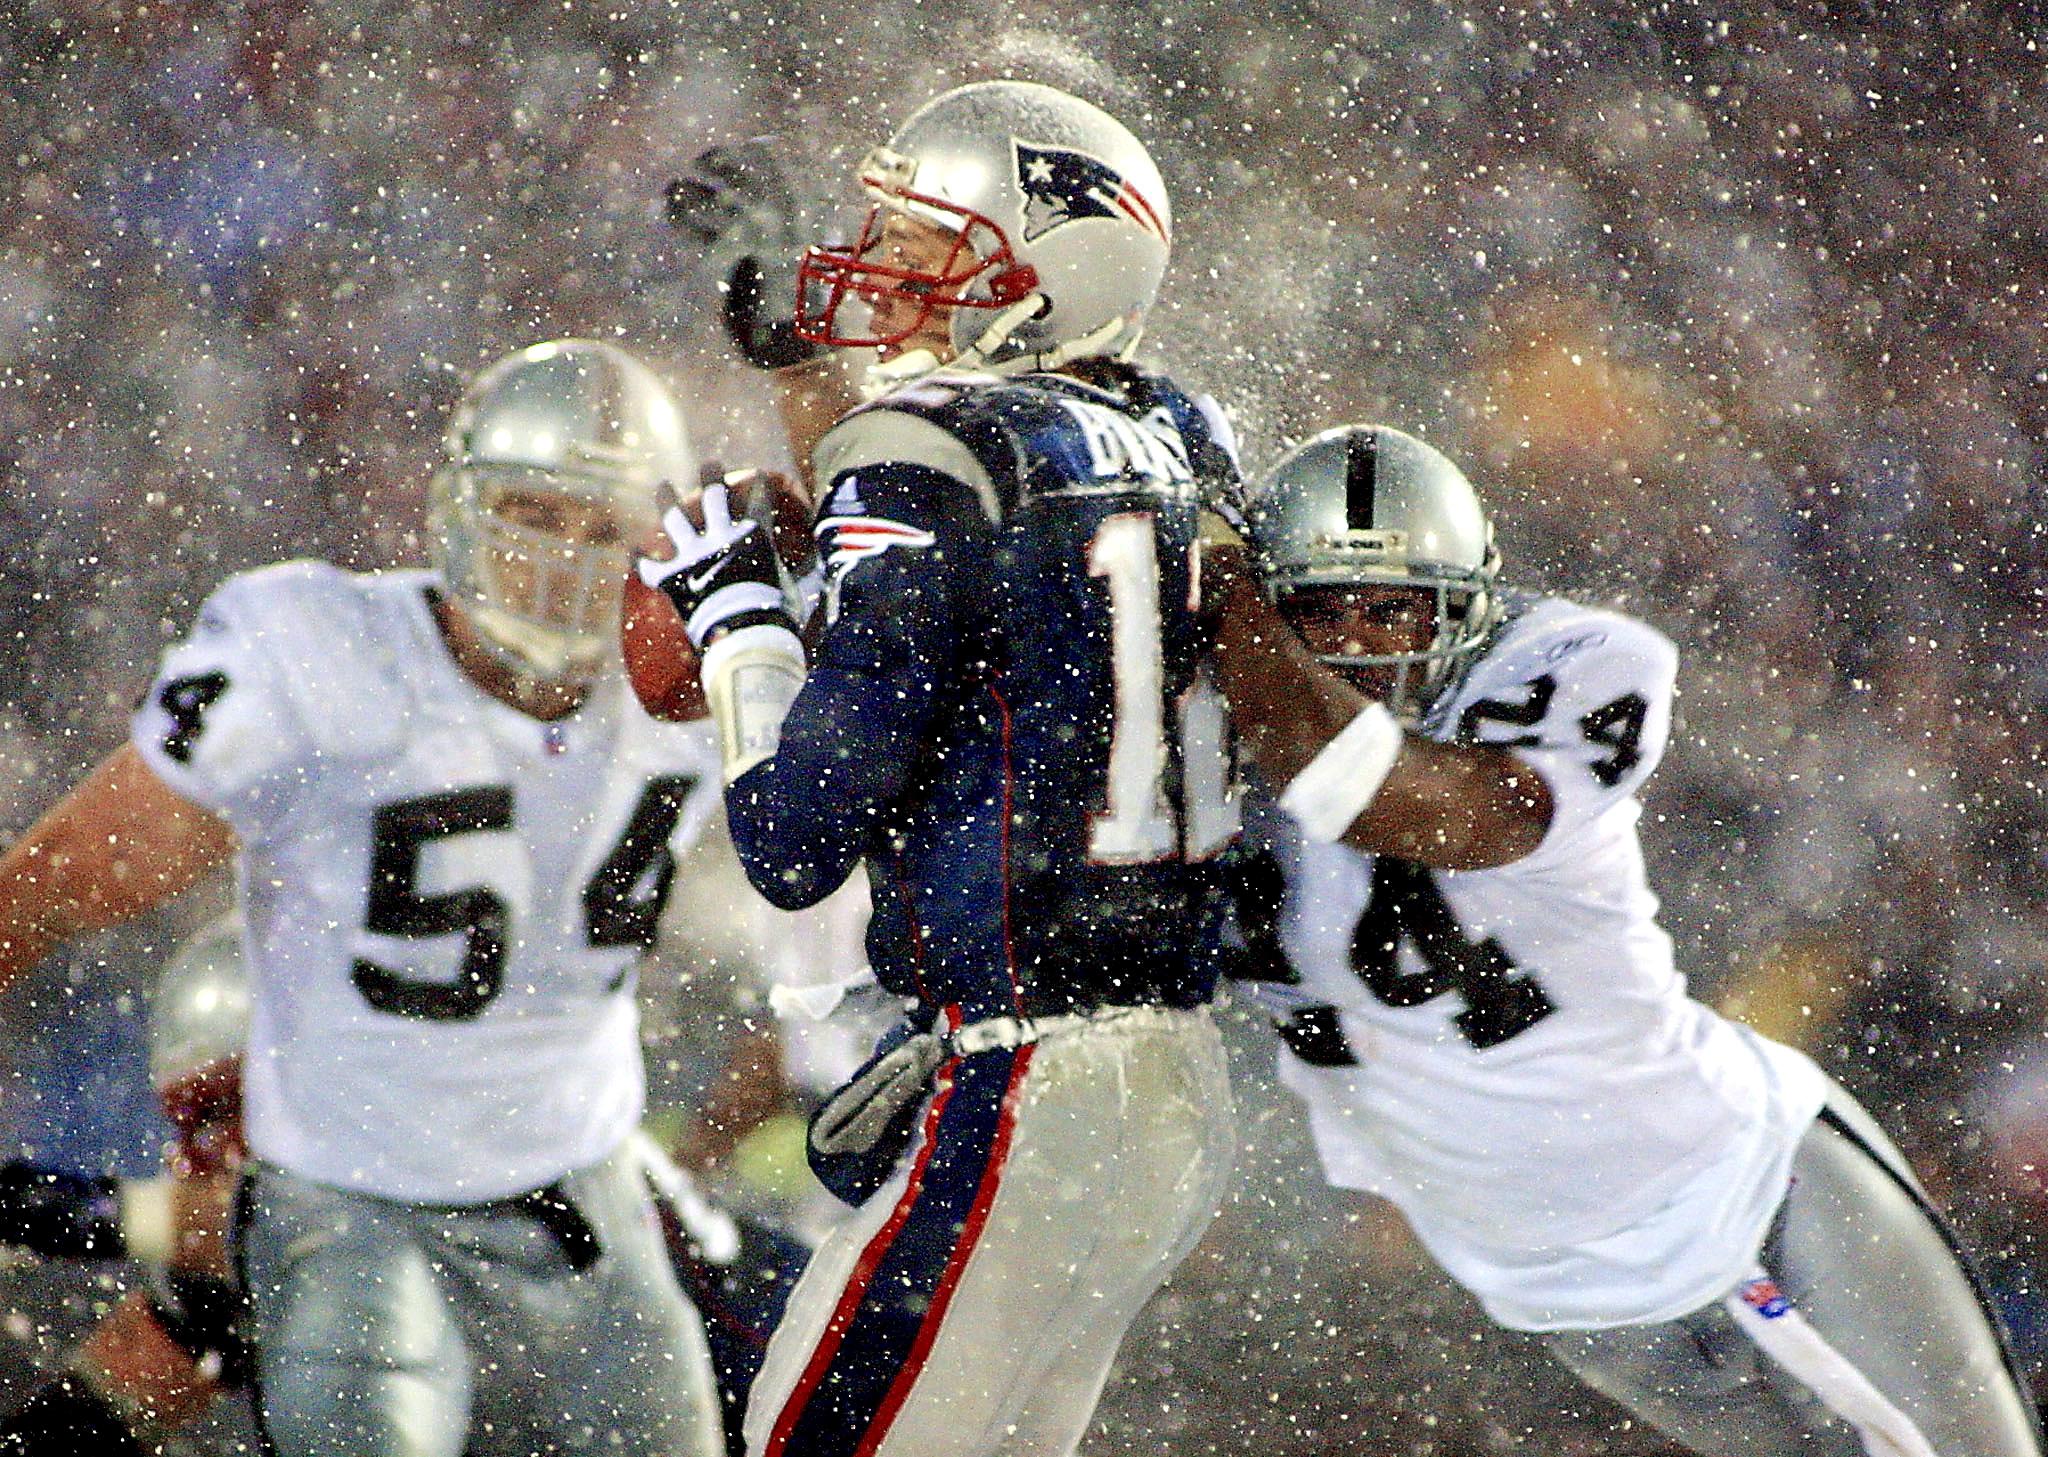 Patriots and Raiders